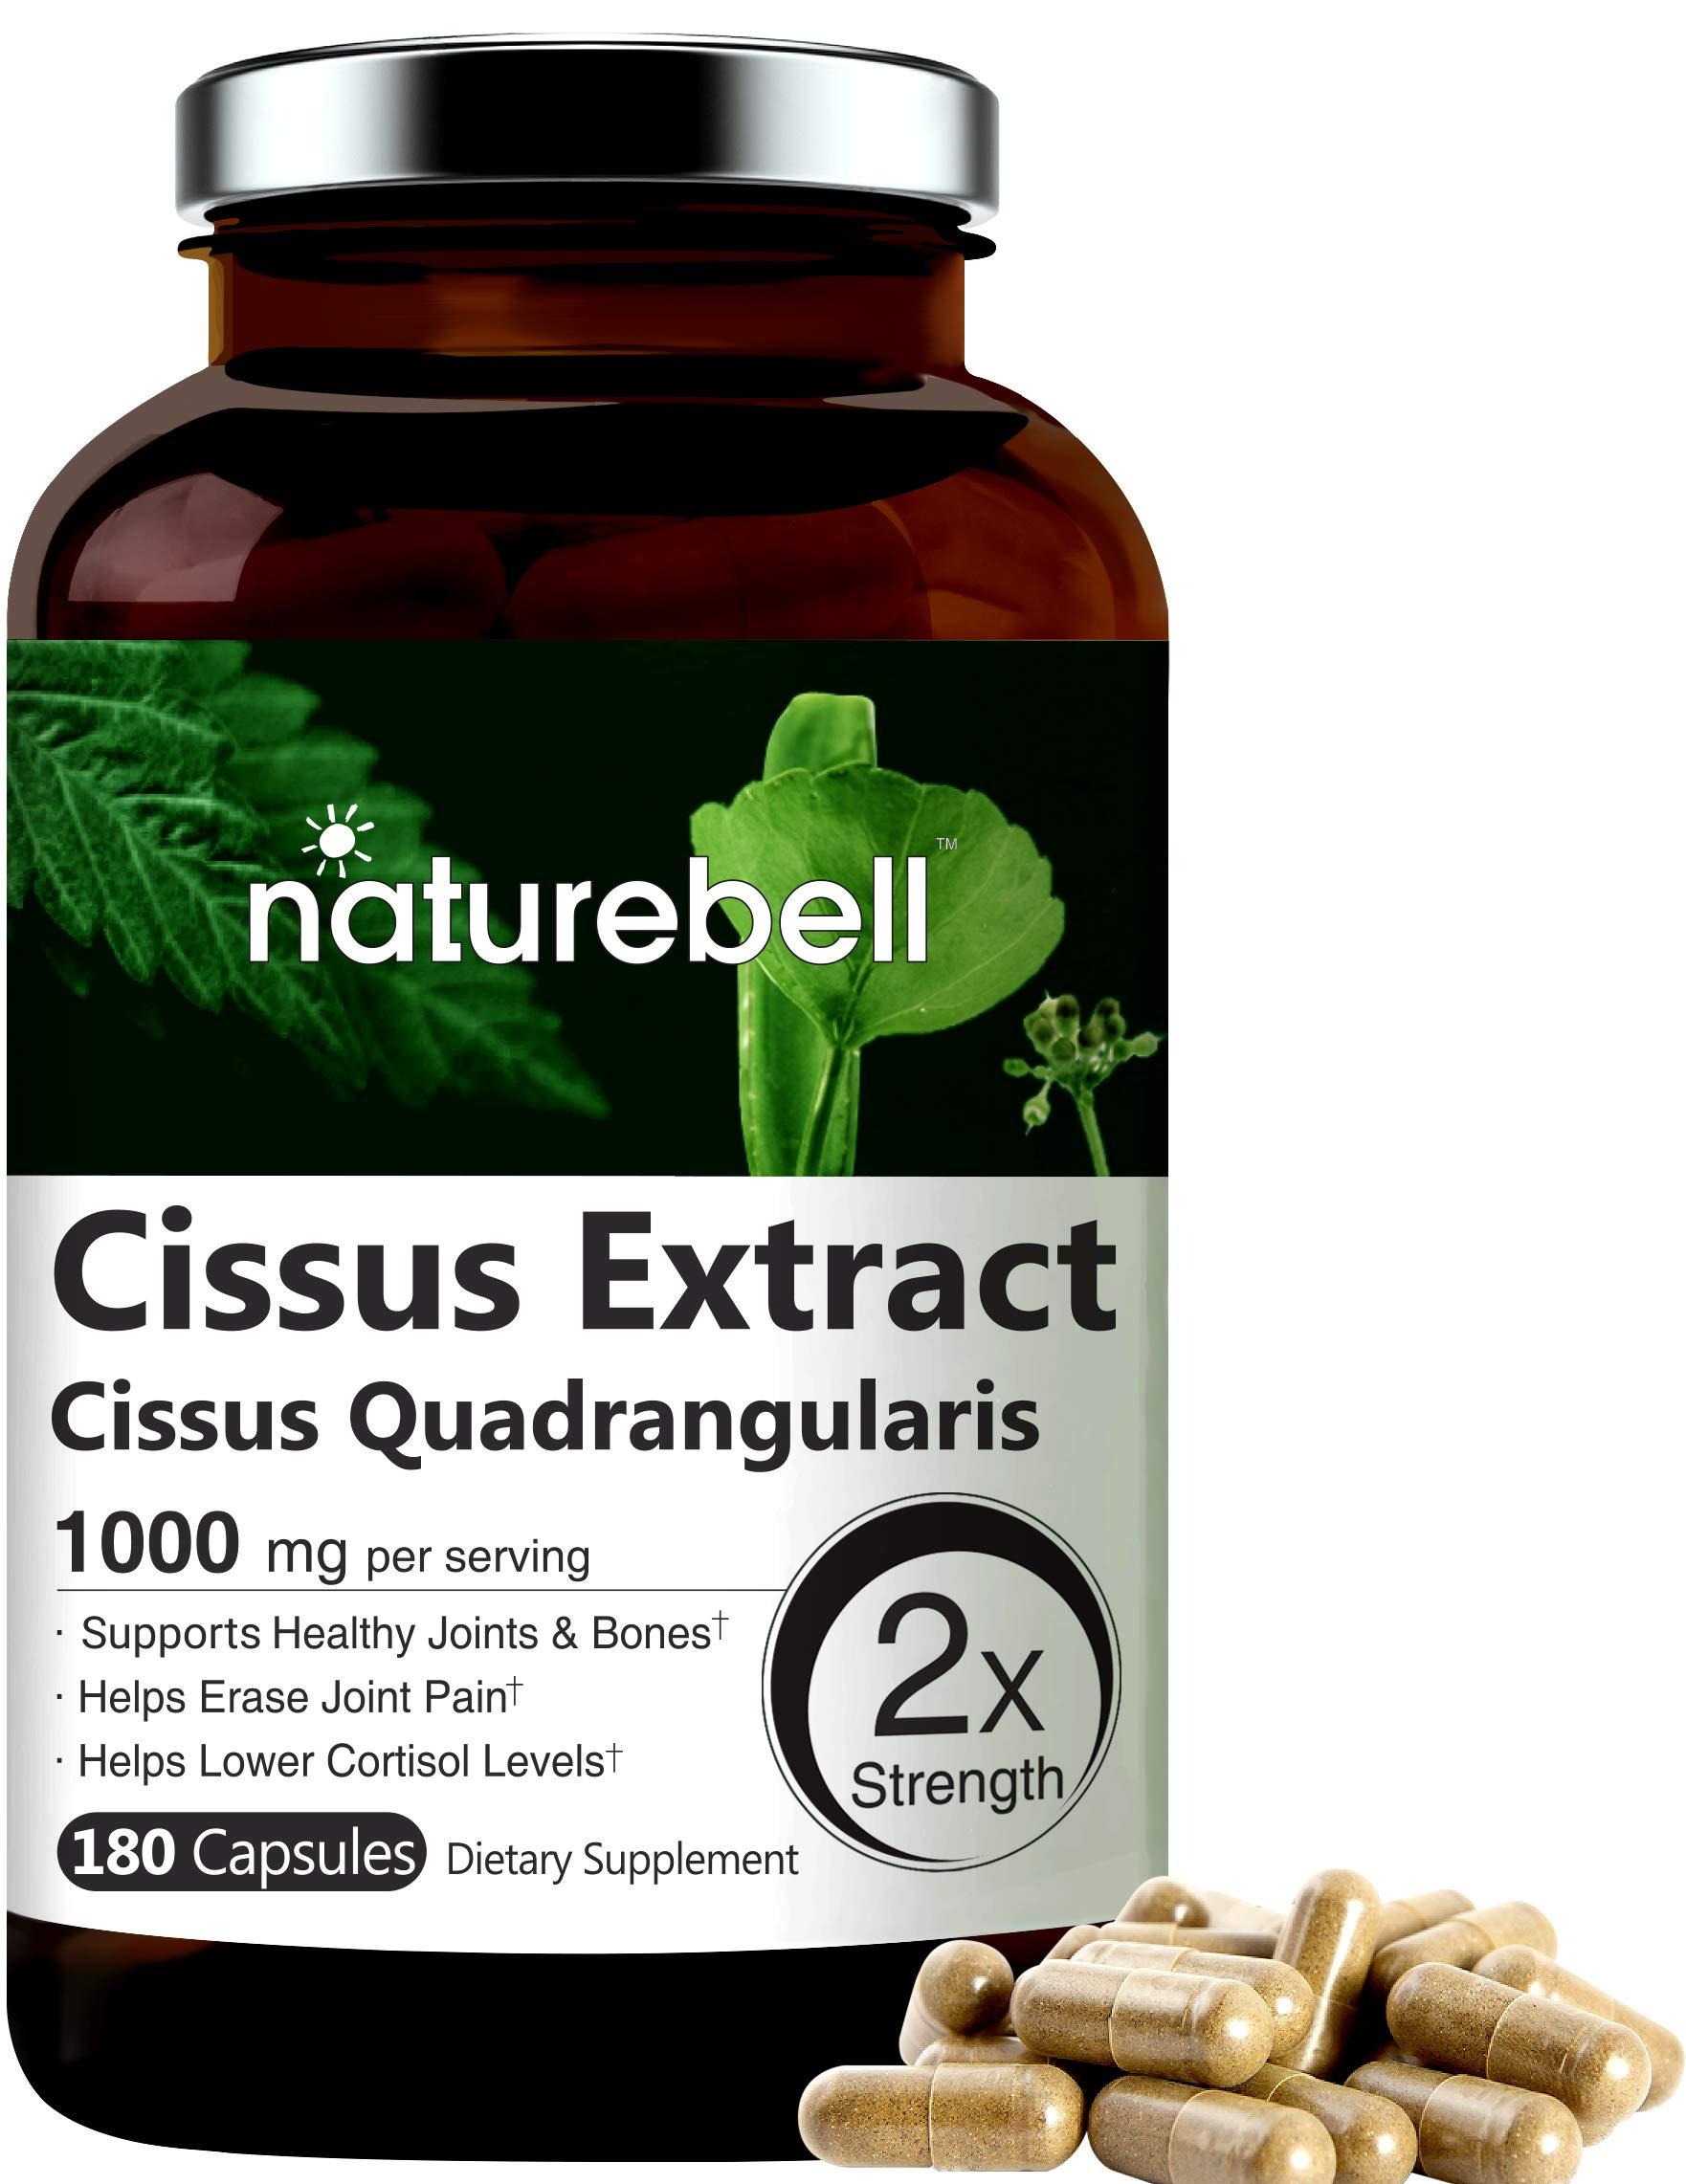 NatureBell Cissus Quadrangularis Capsules, 1000mg Per Serving, 180 Capsules, Premium Cissus Capsules, Support Joint, Tendon, Bone, Skin, Hair and Cartilage.